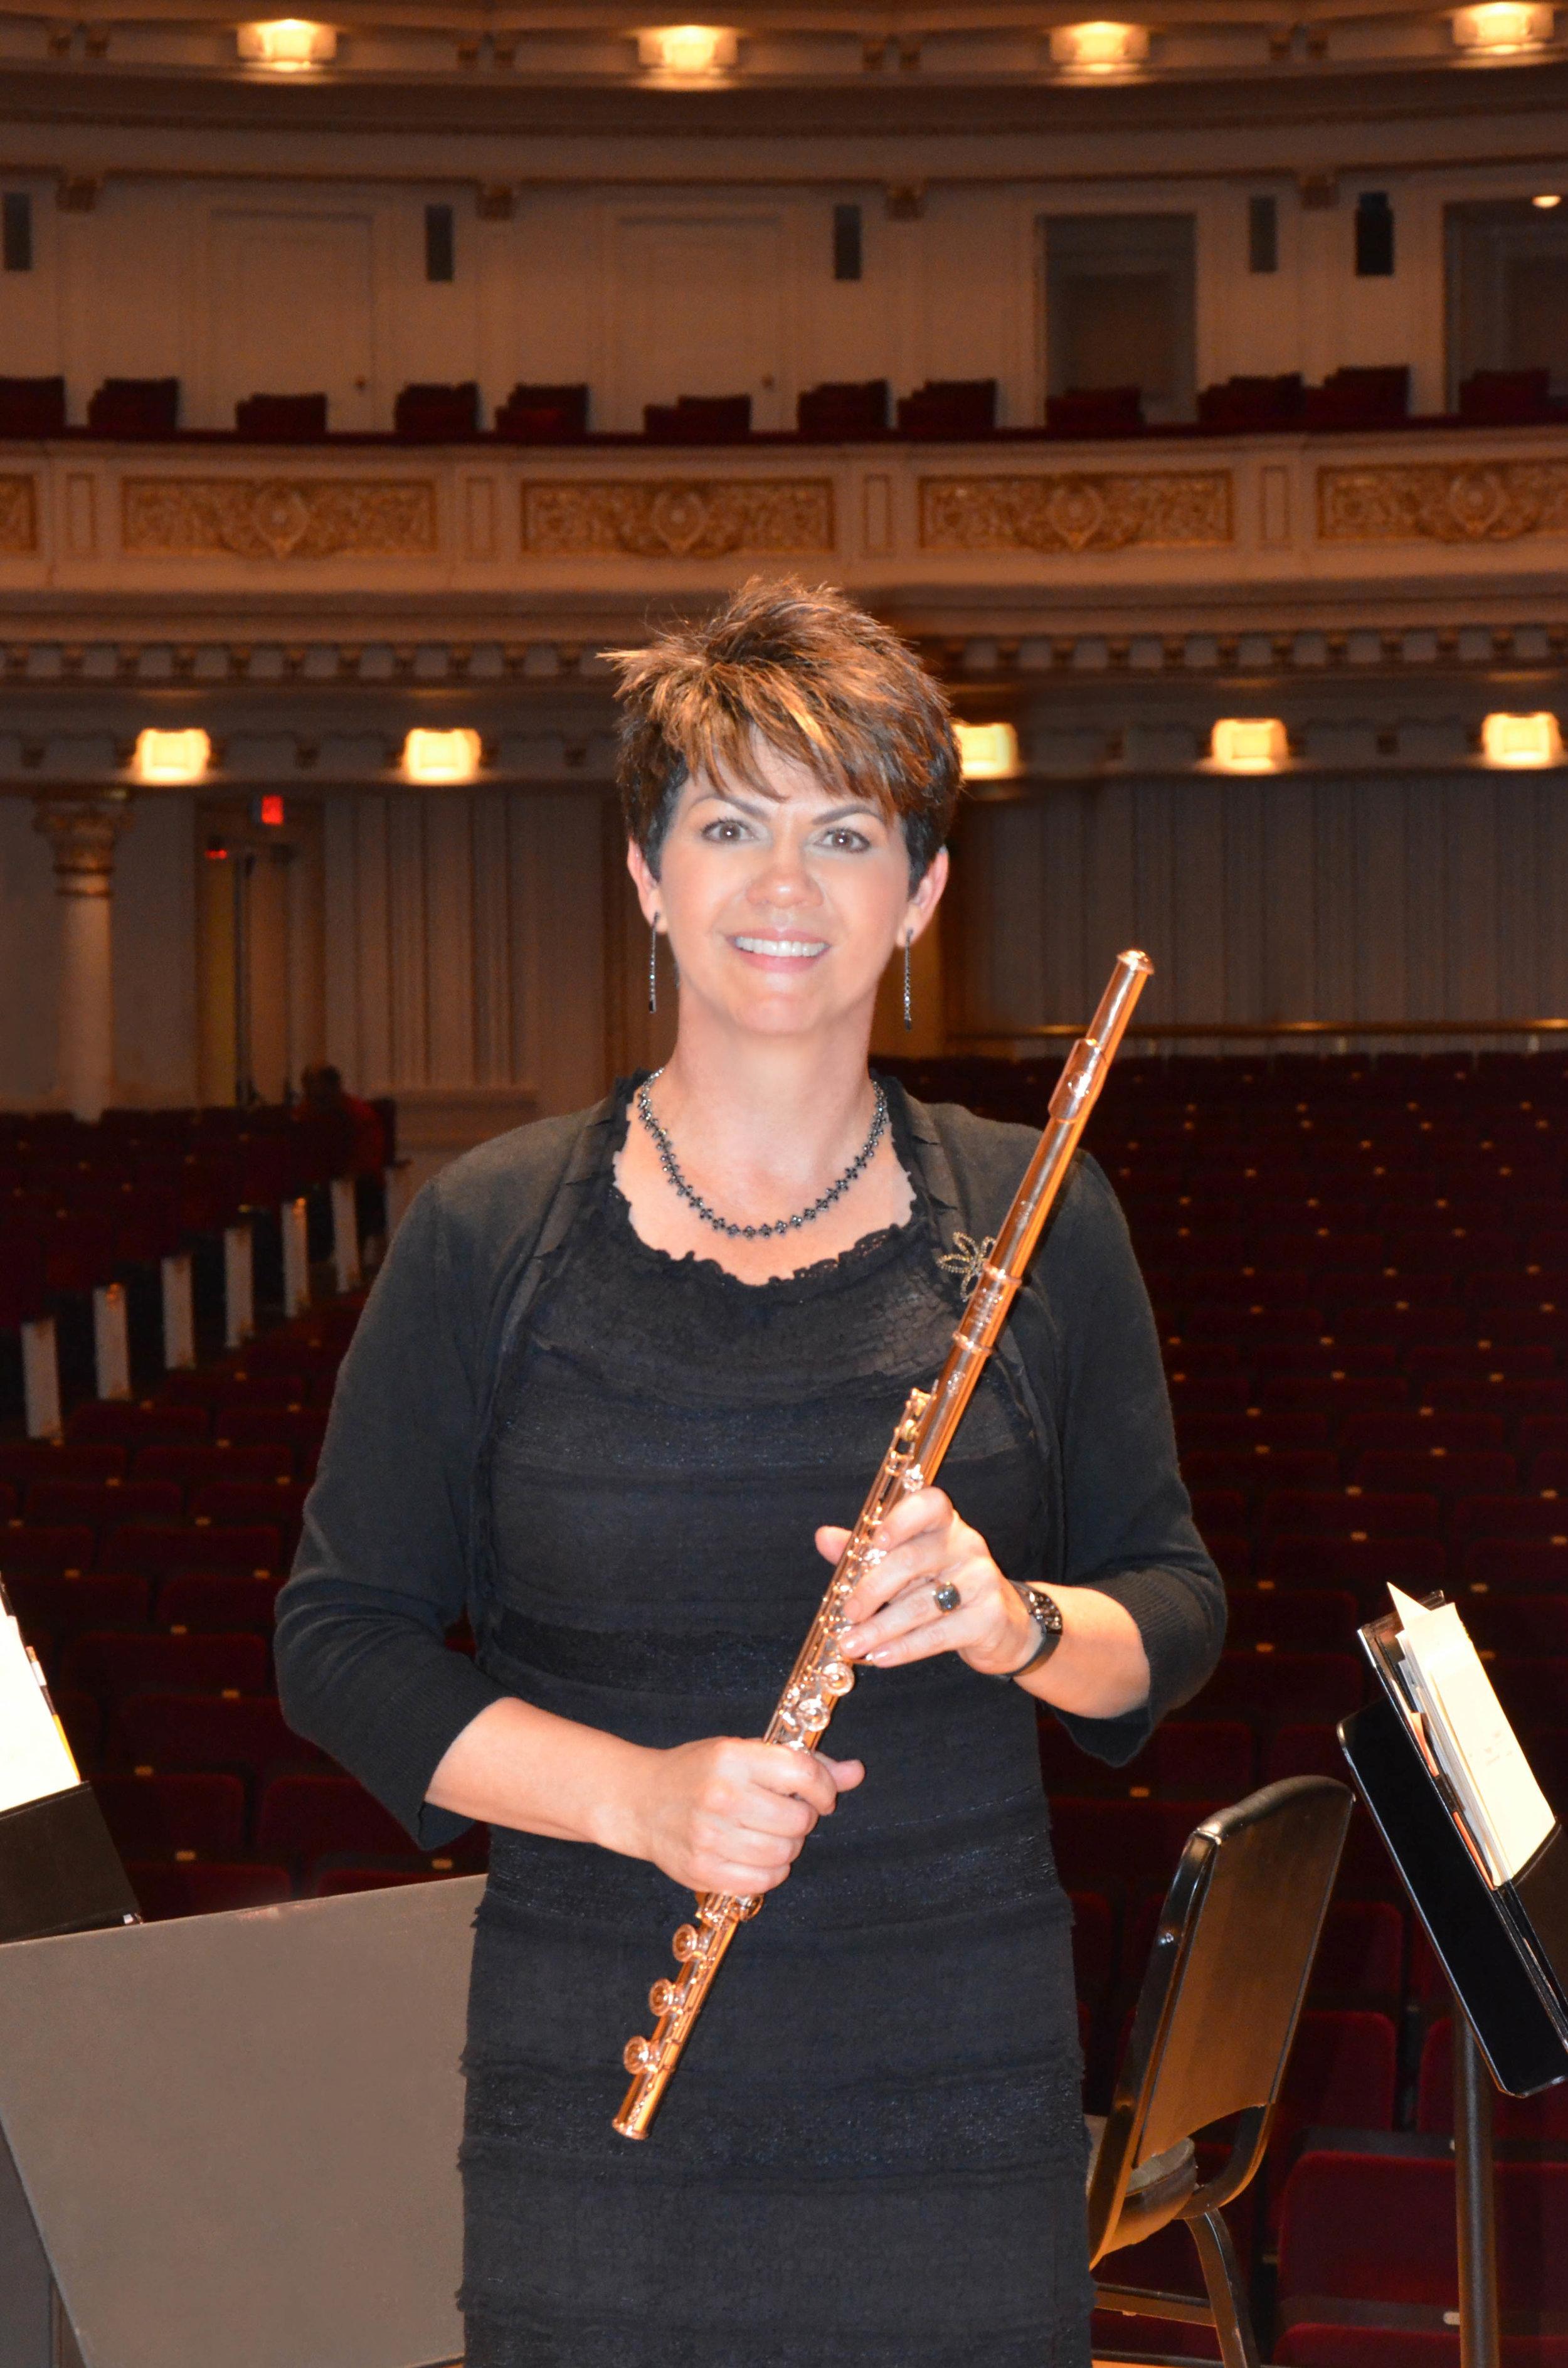 Jeannine Goecckeritz - Performing Artist - Flute - Carnegie Hall -.jpg